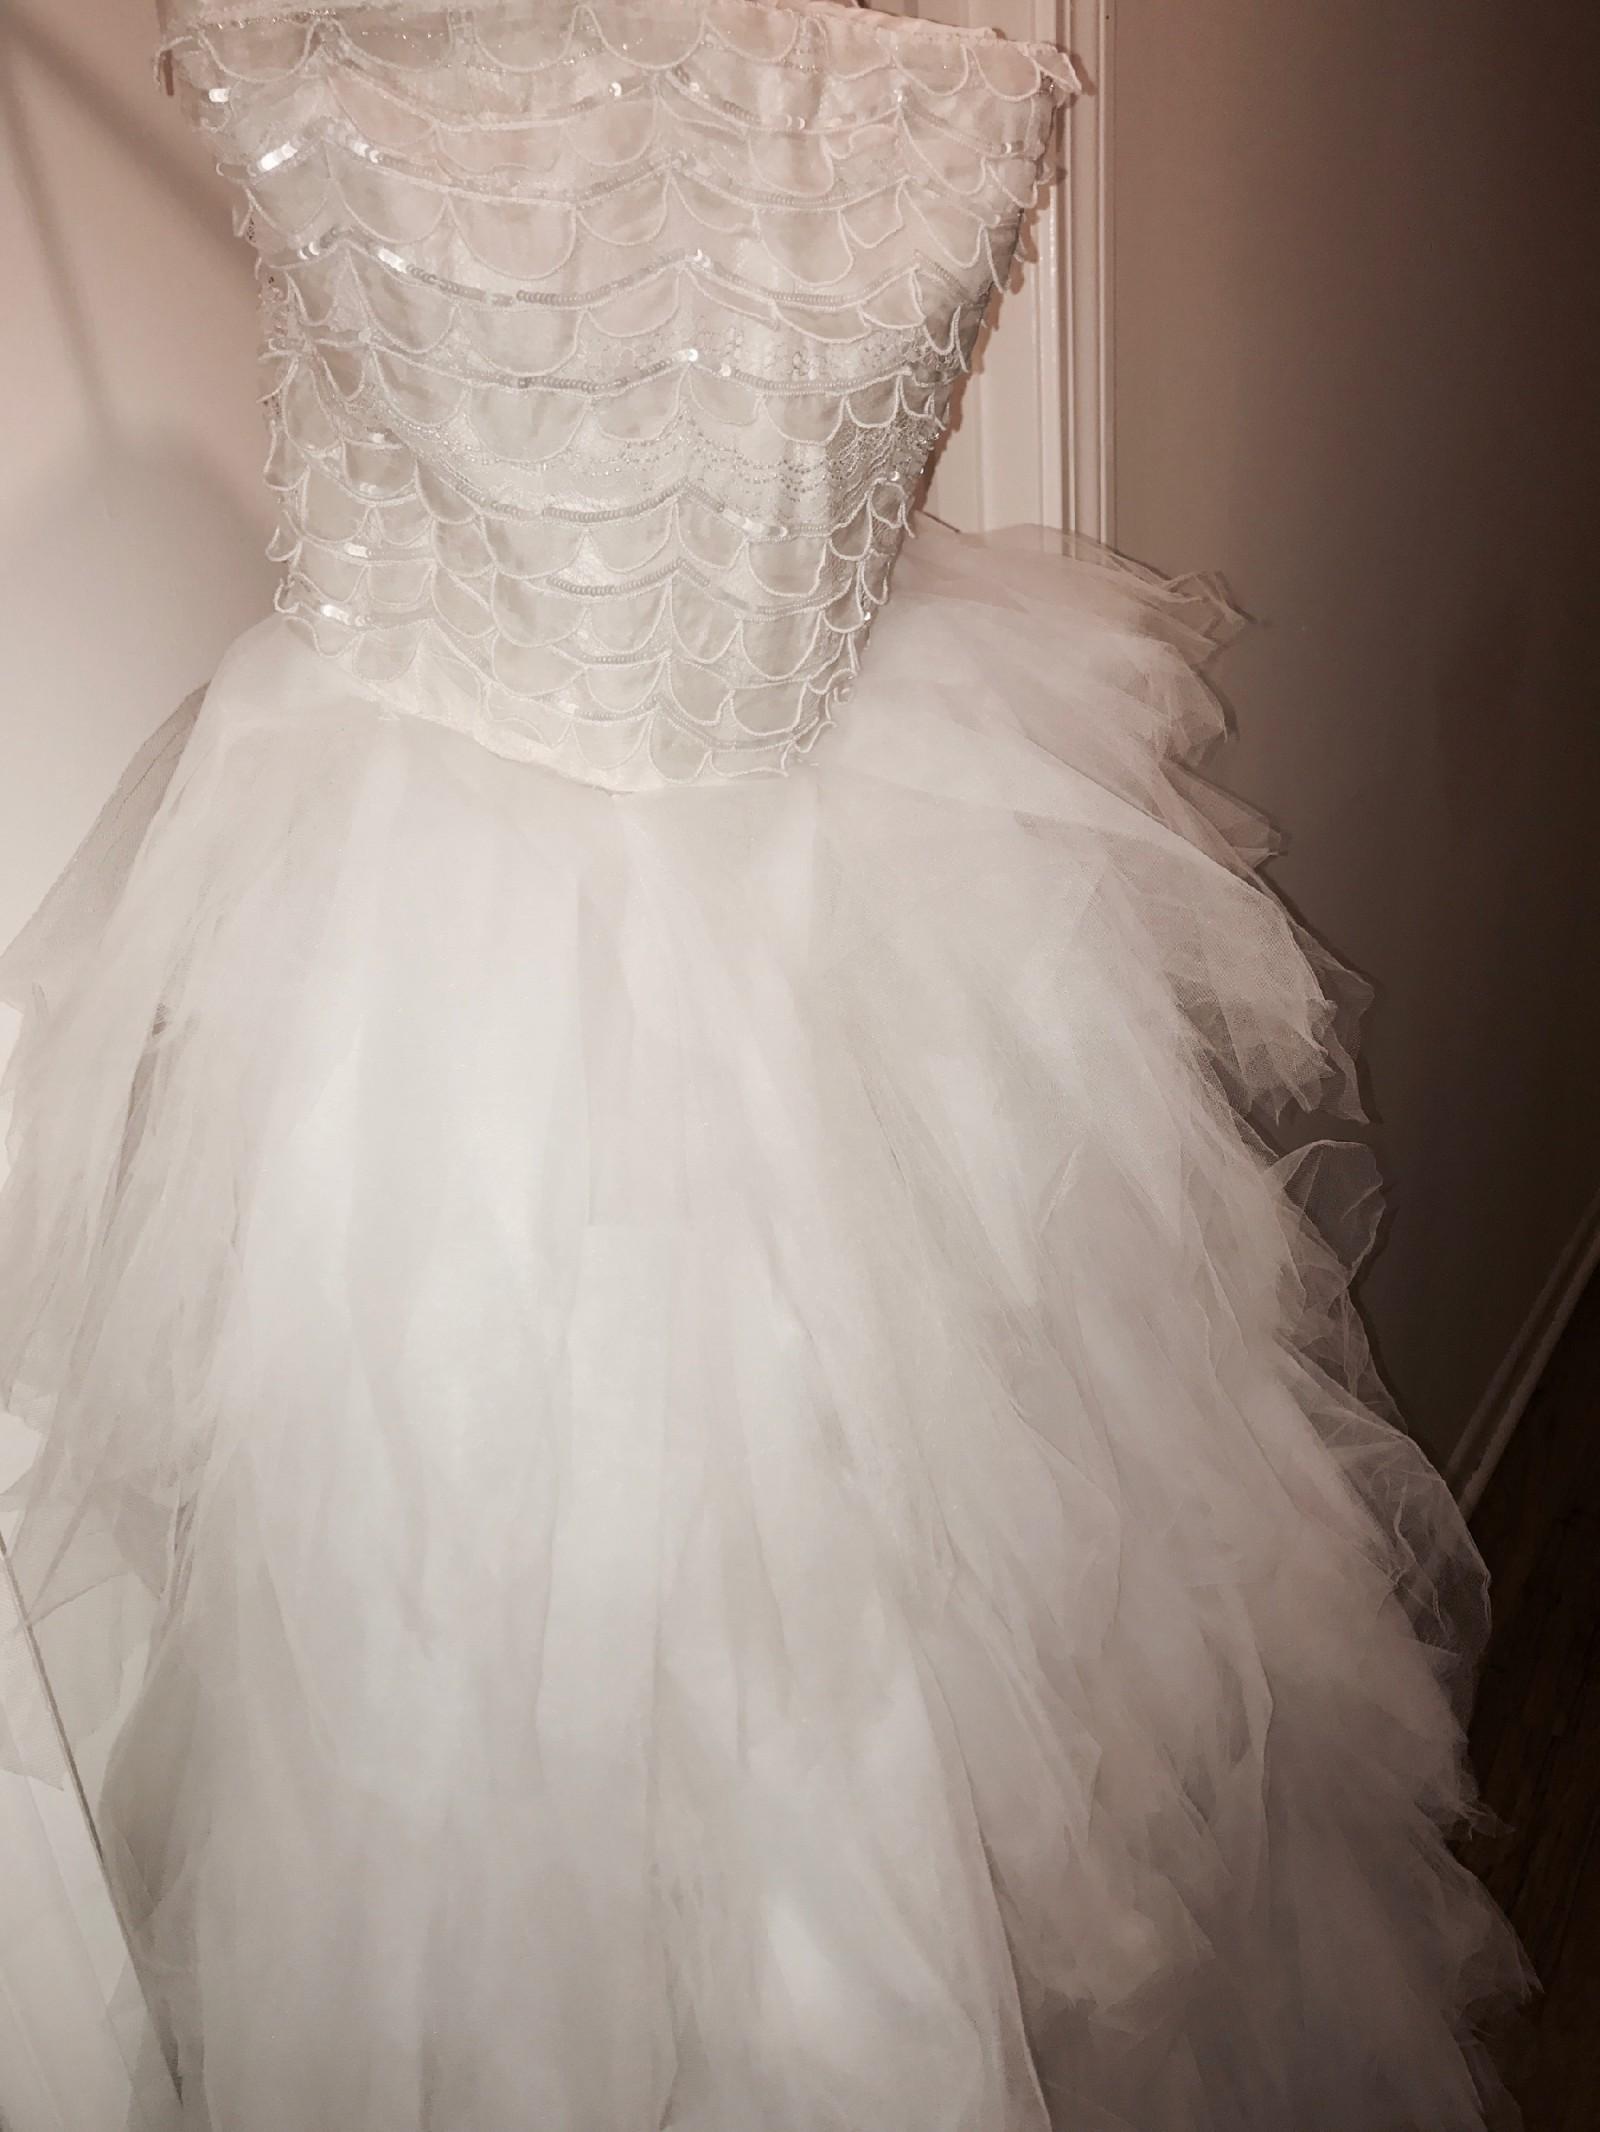 Oscar de la renta custom made 33e77 new wedding dress on for How much do oscar de la renta wedding dresses cost